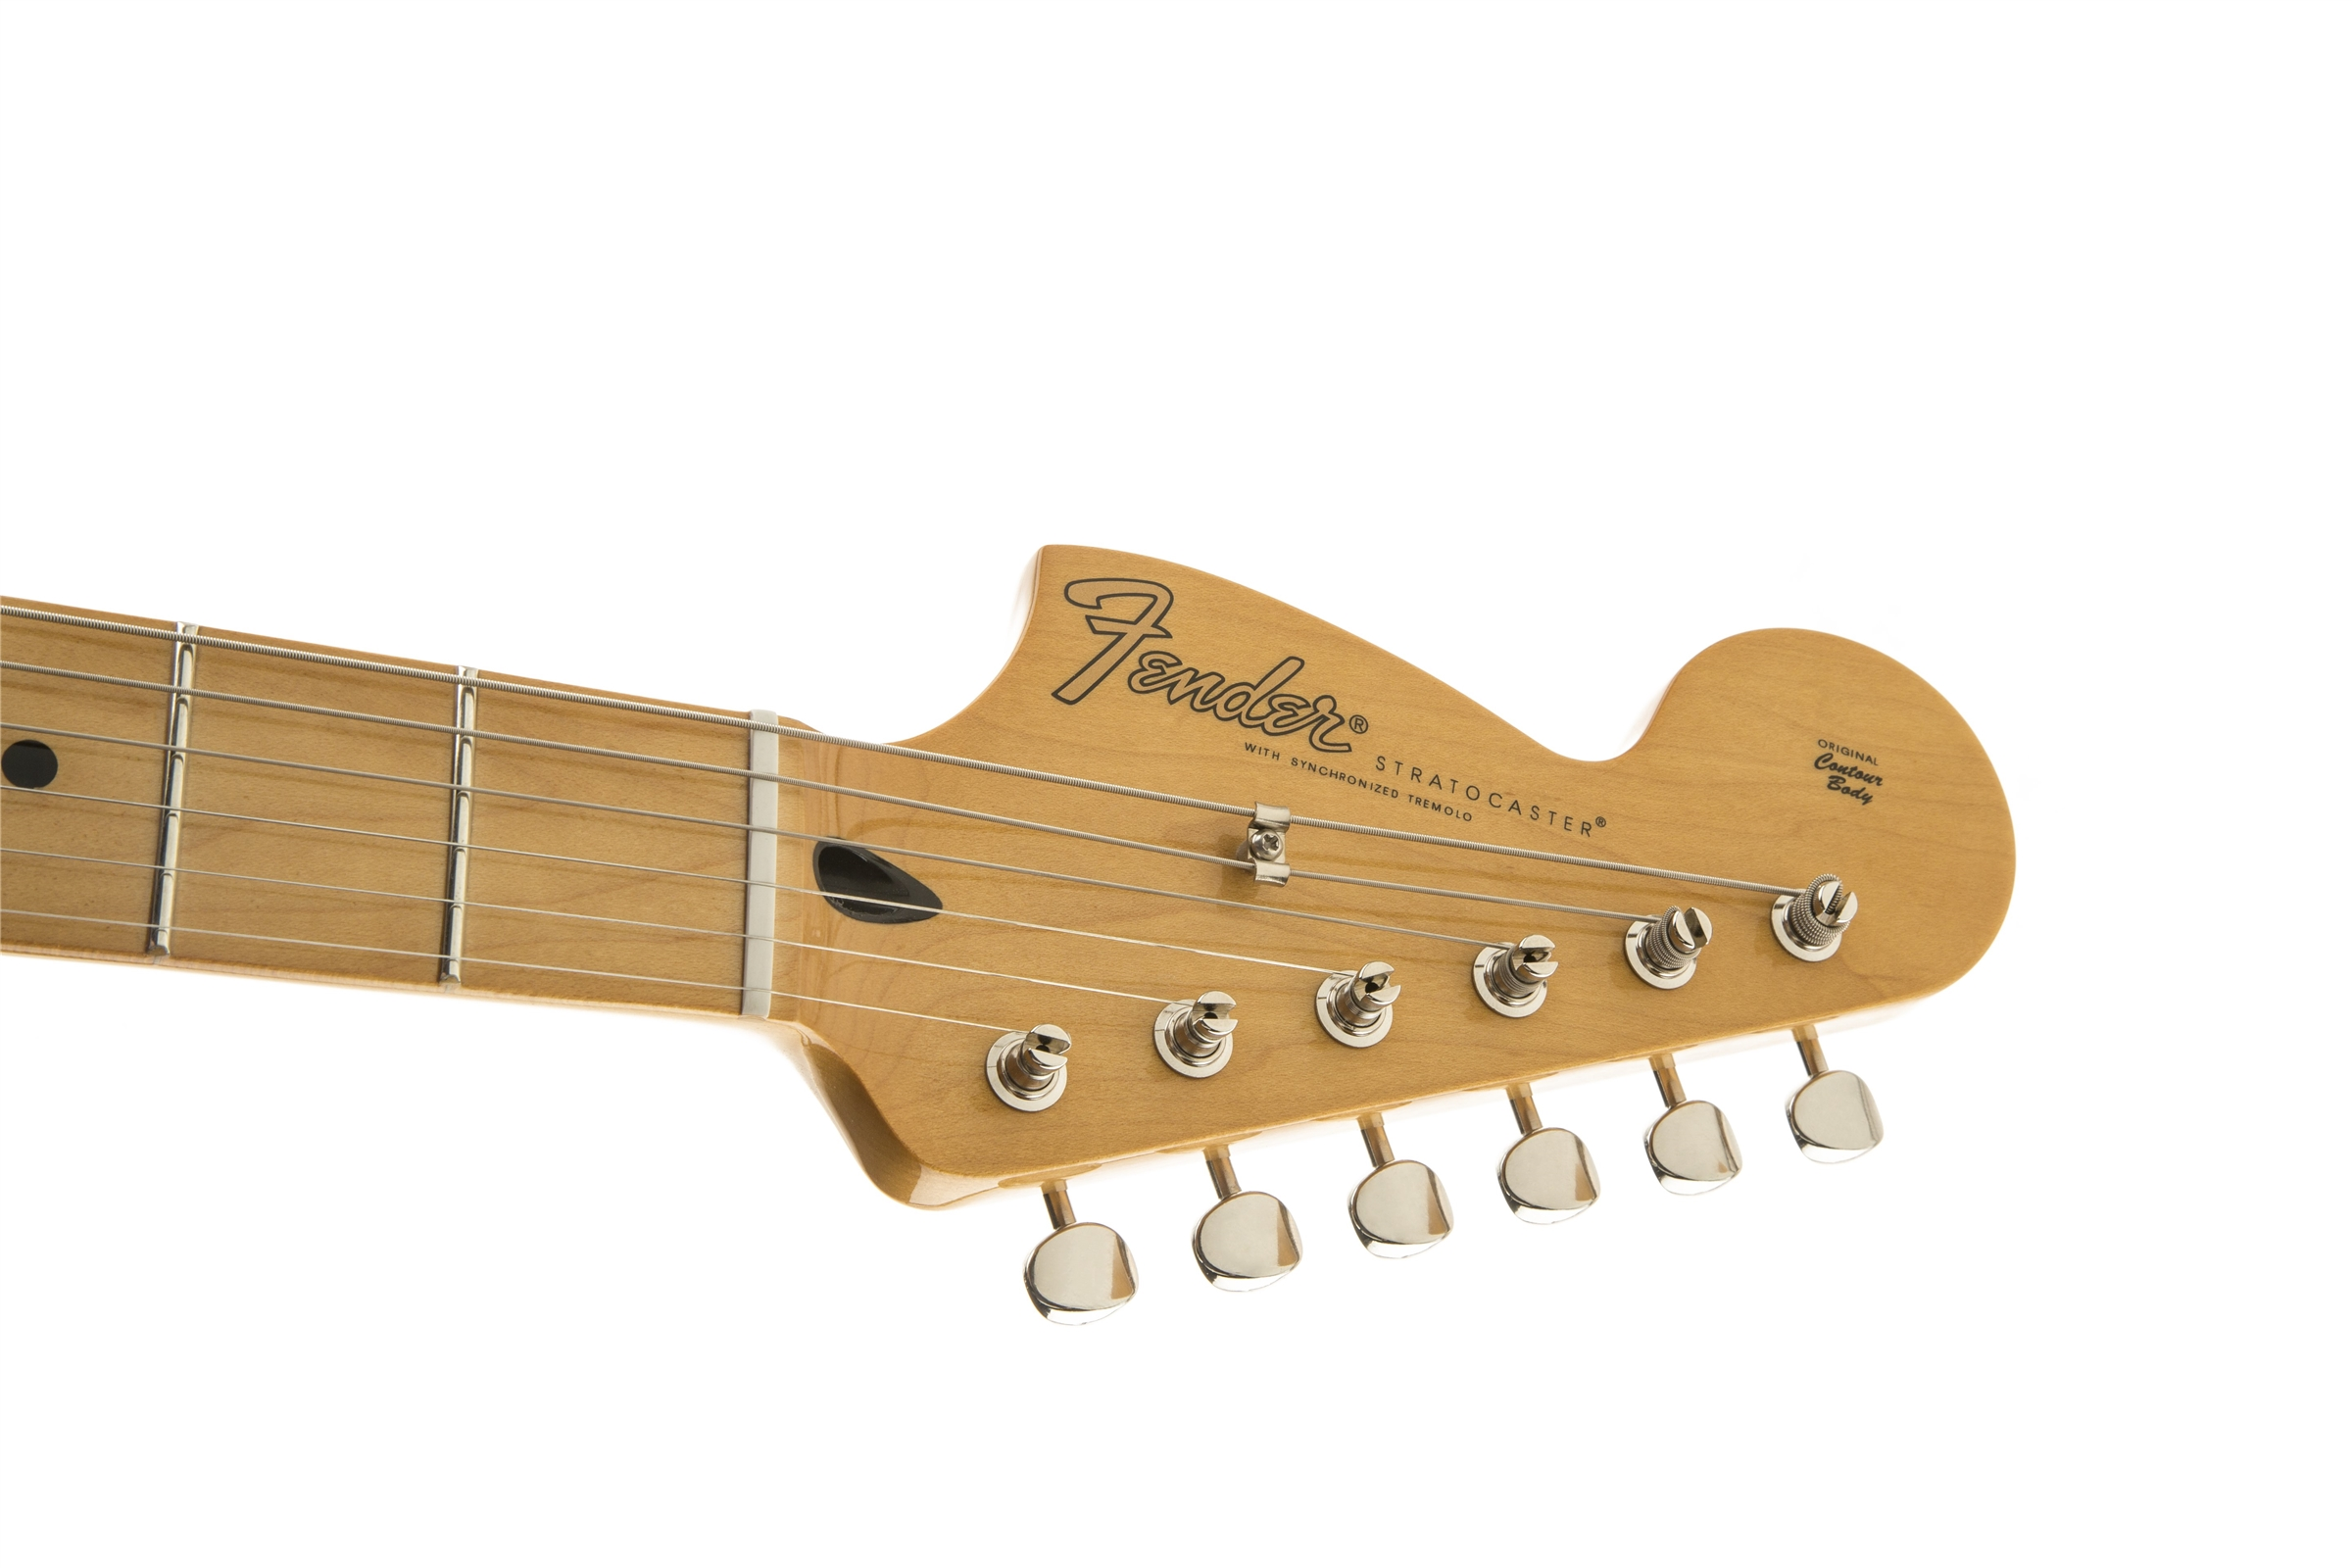 Fender Jimi Hendrix Stratocaster® Artist Series Black Maple Fingerboard Electric Guitar